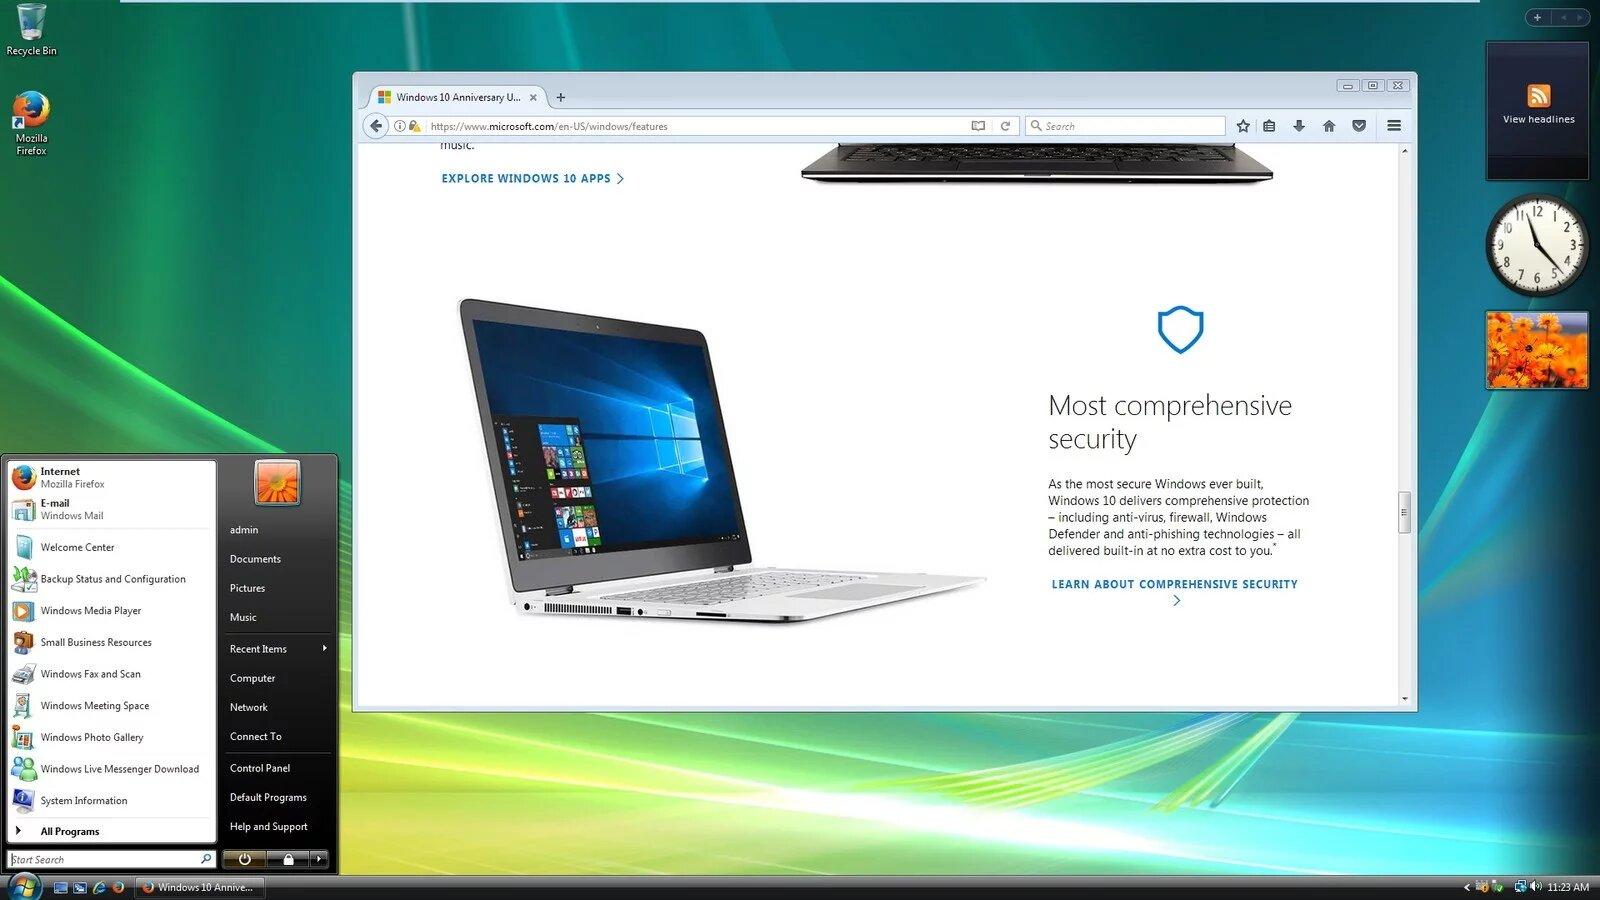 Cómo actualizar Windows Vista a Windows 7 o 10 2